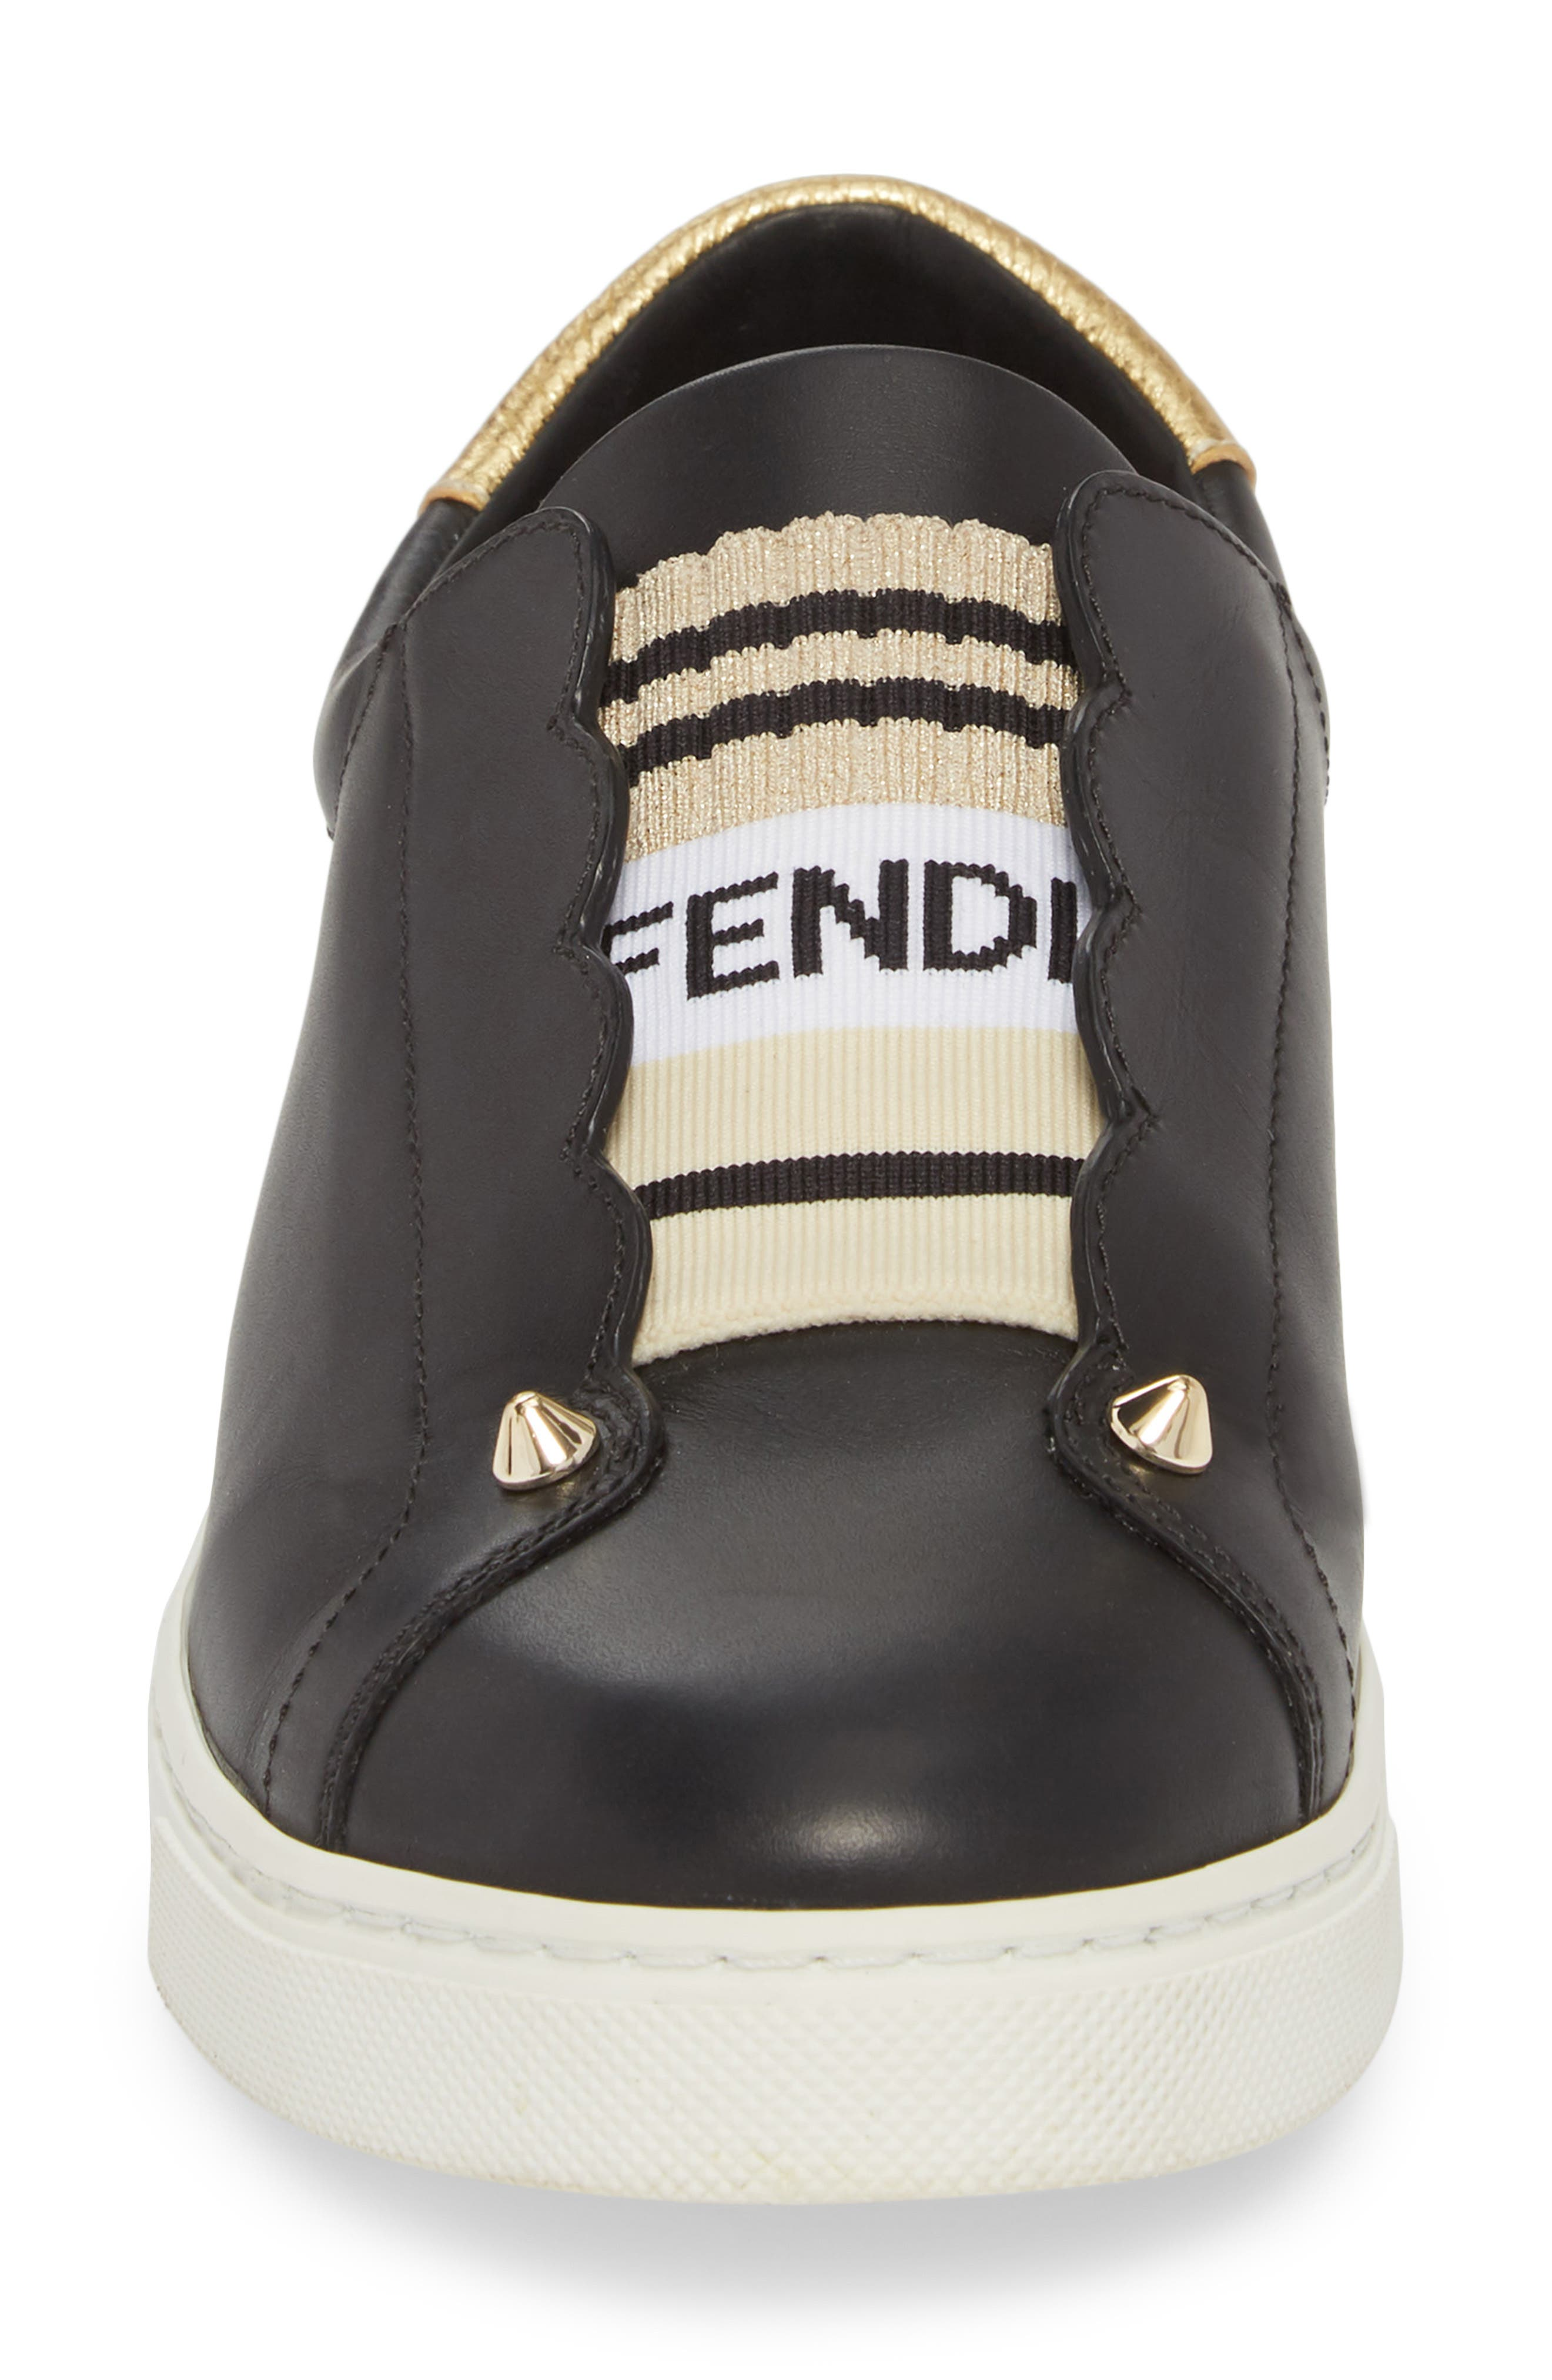 Rockono Slip-On Sneaker,                             Alternate thumbnail 4, color,                             Black